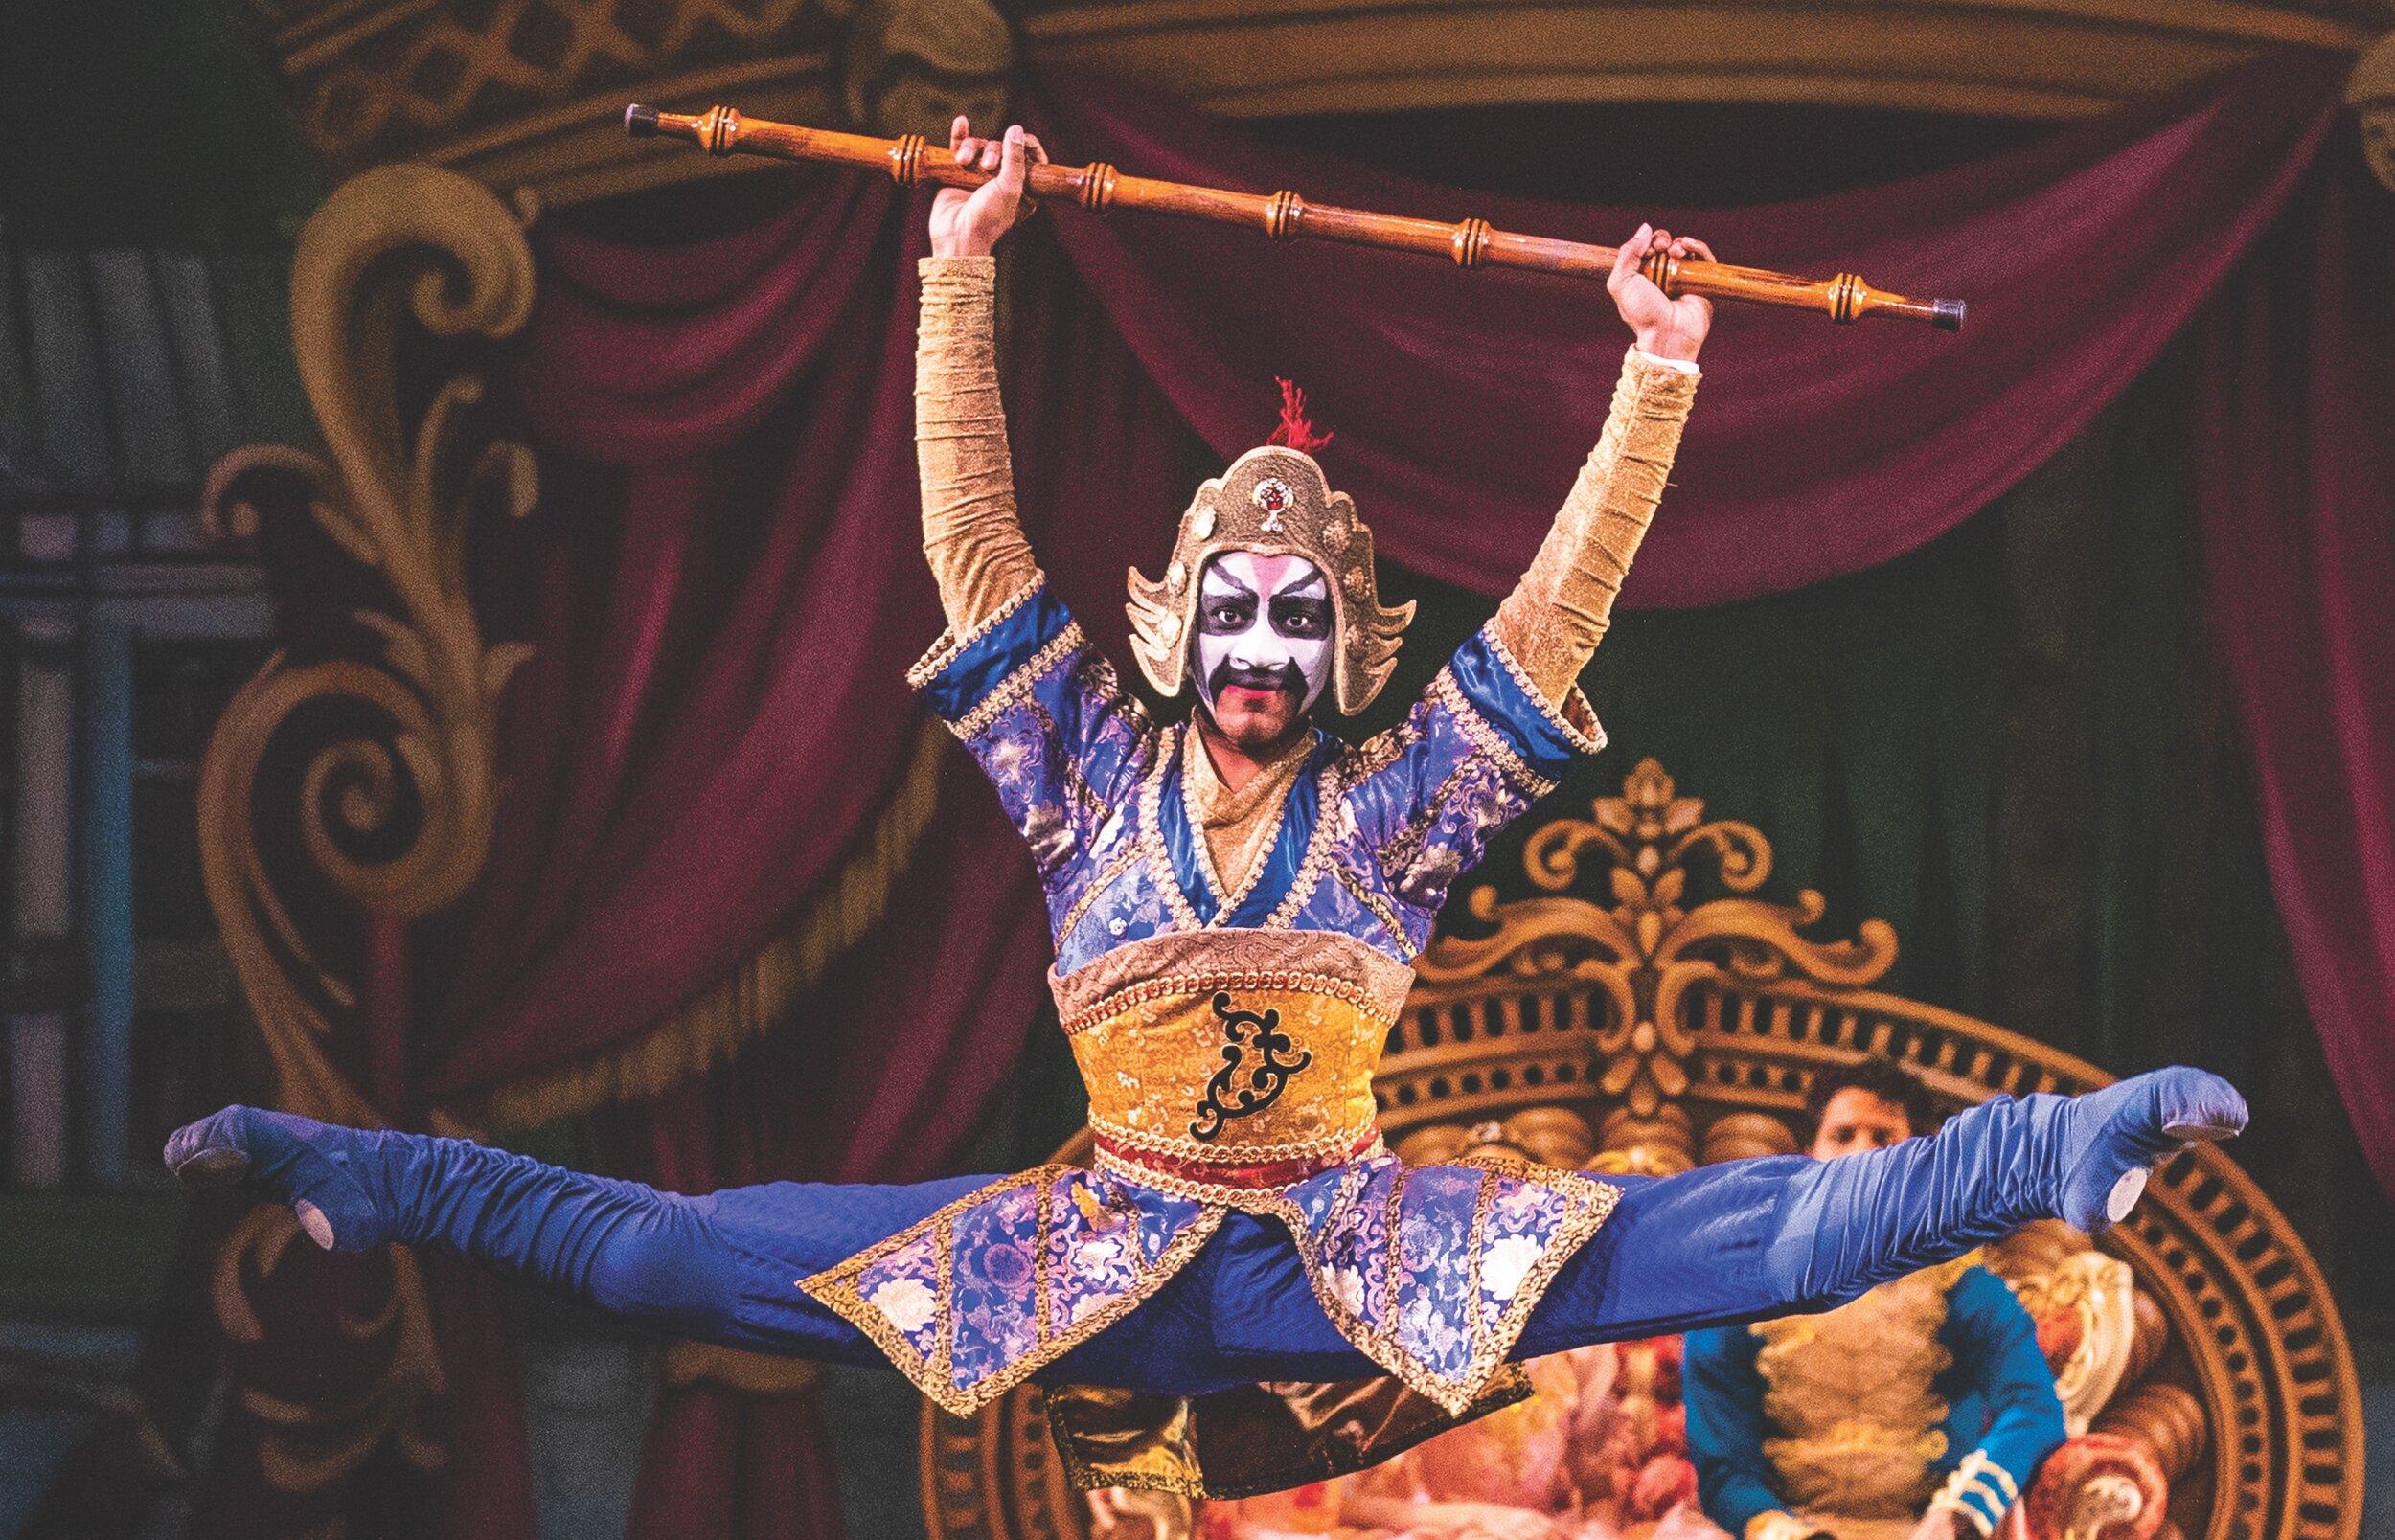 Peking Opera-inspired Chinese from Ballet West's Nutcracker